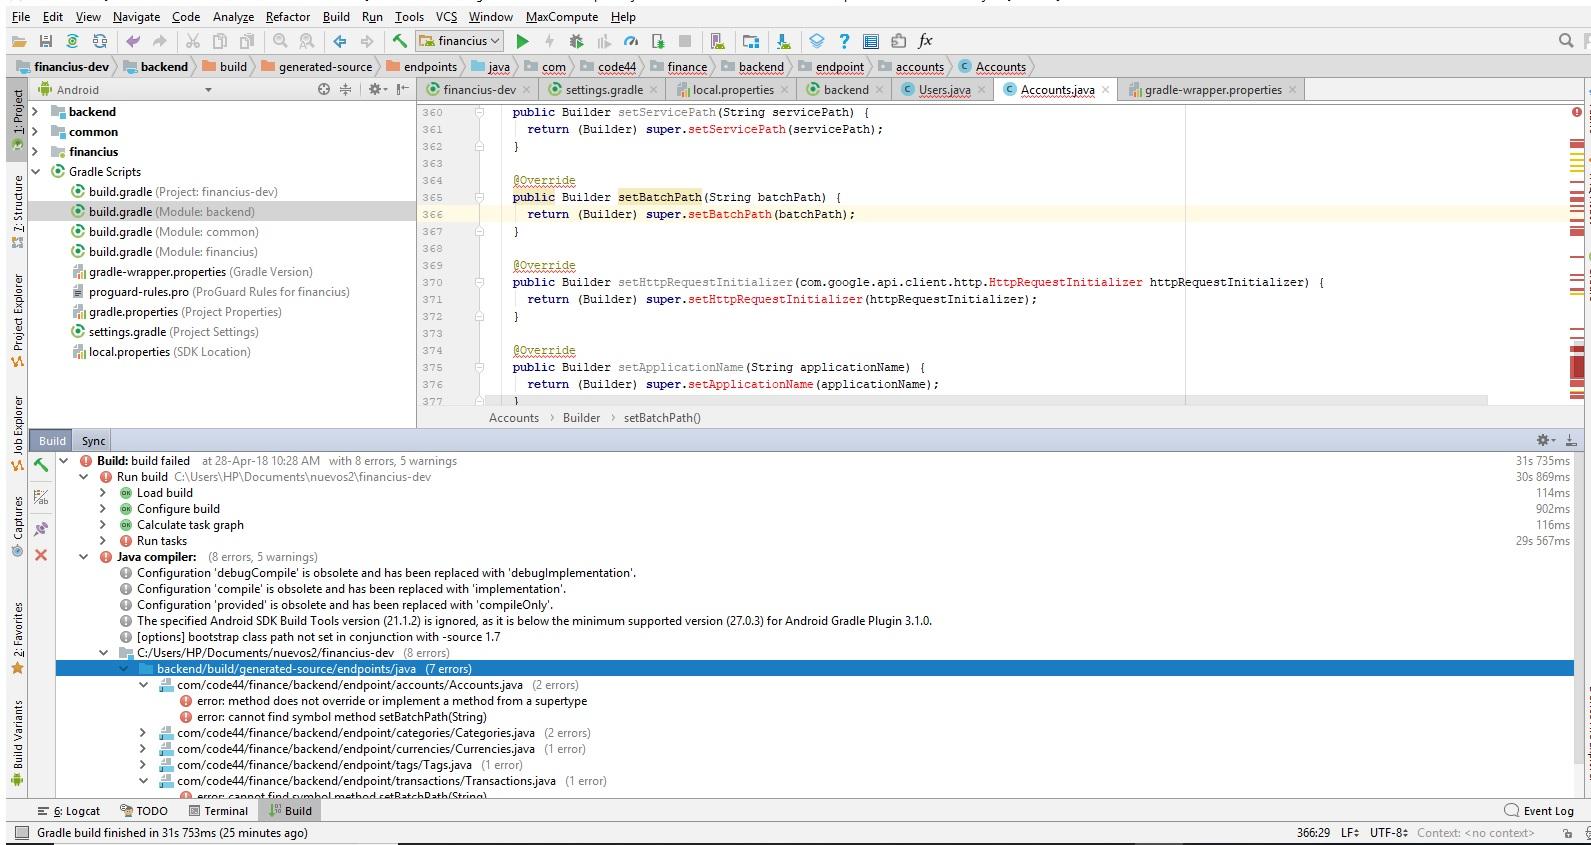 Java I Get Errors When Compiling Error Cannot Find Symbol Method